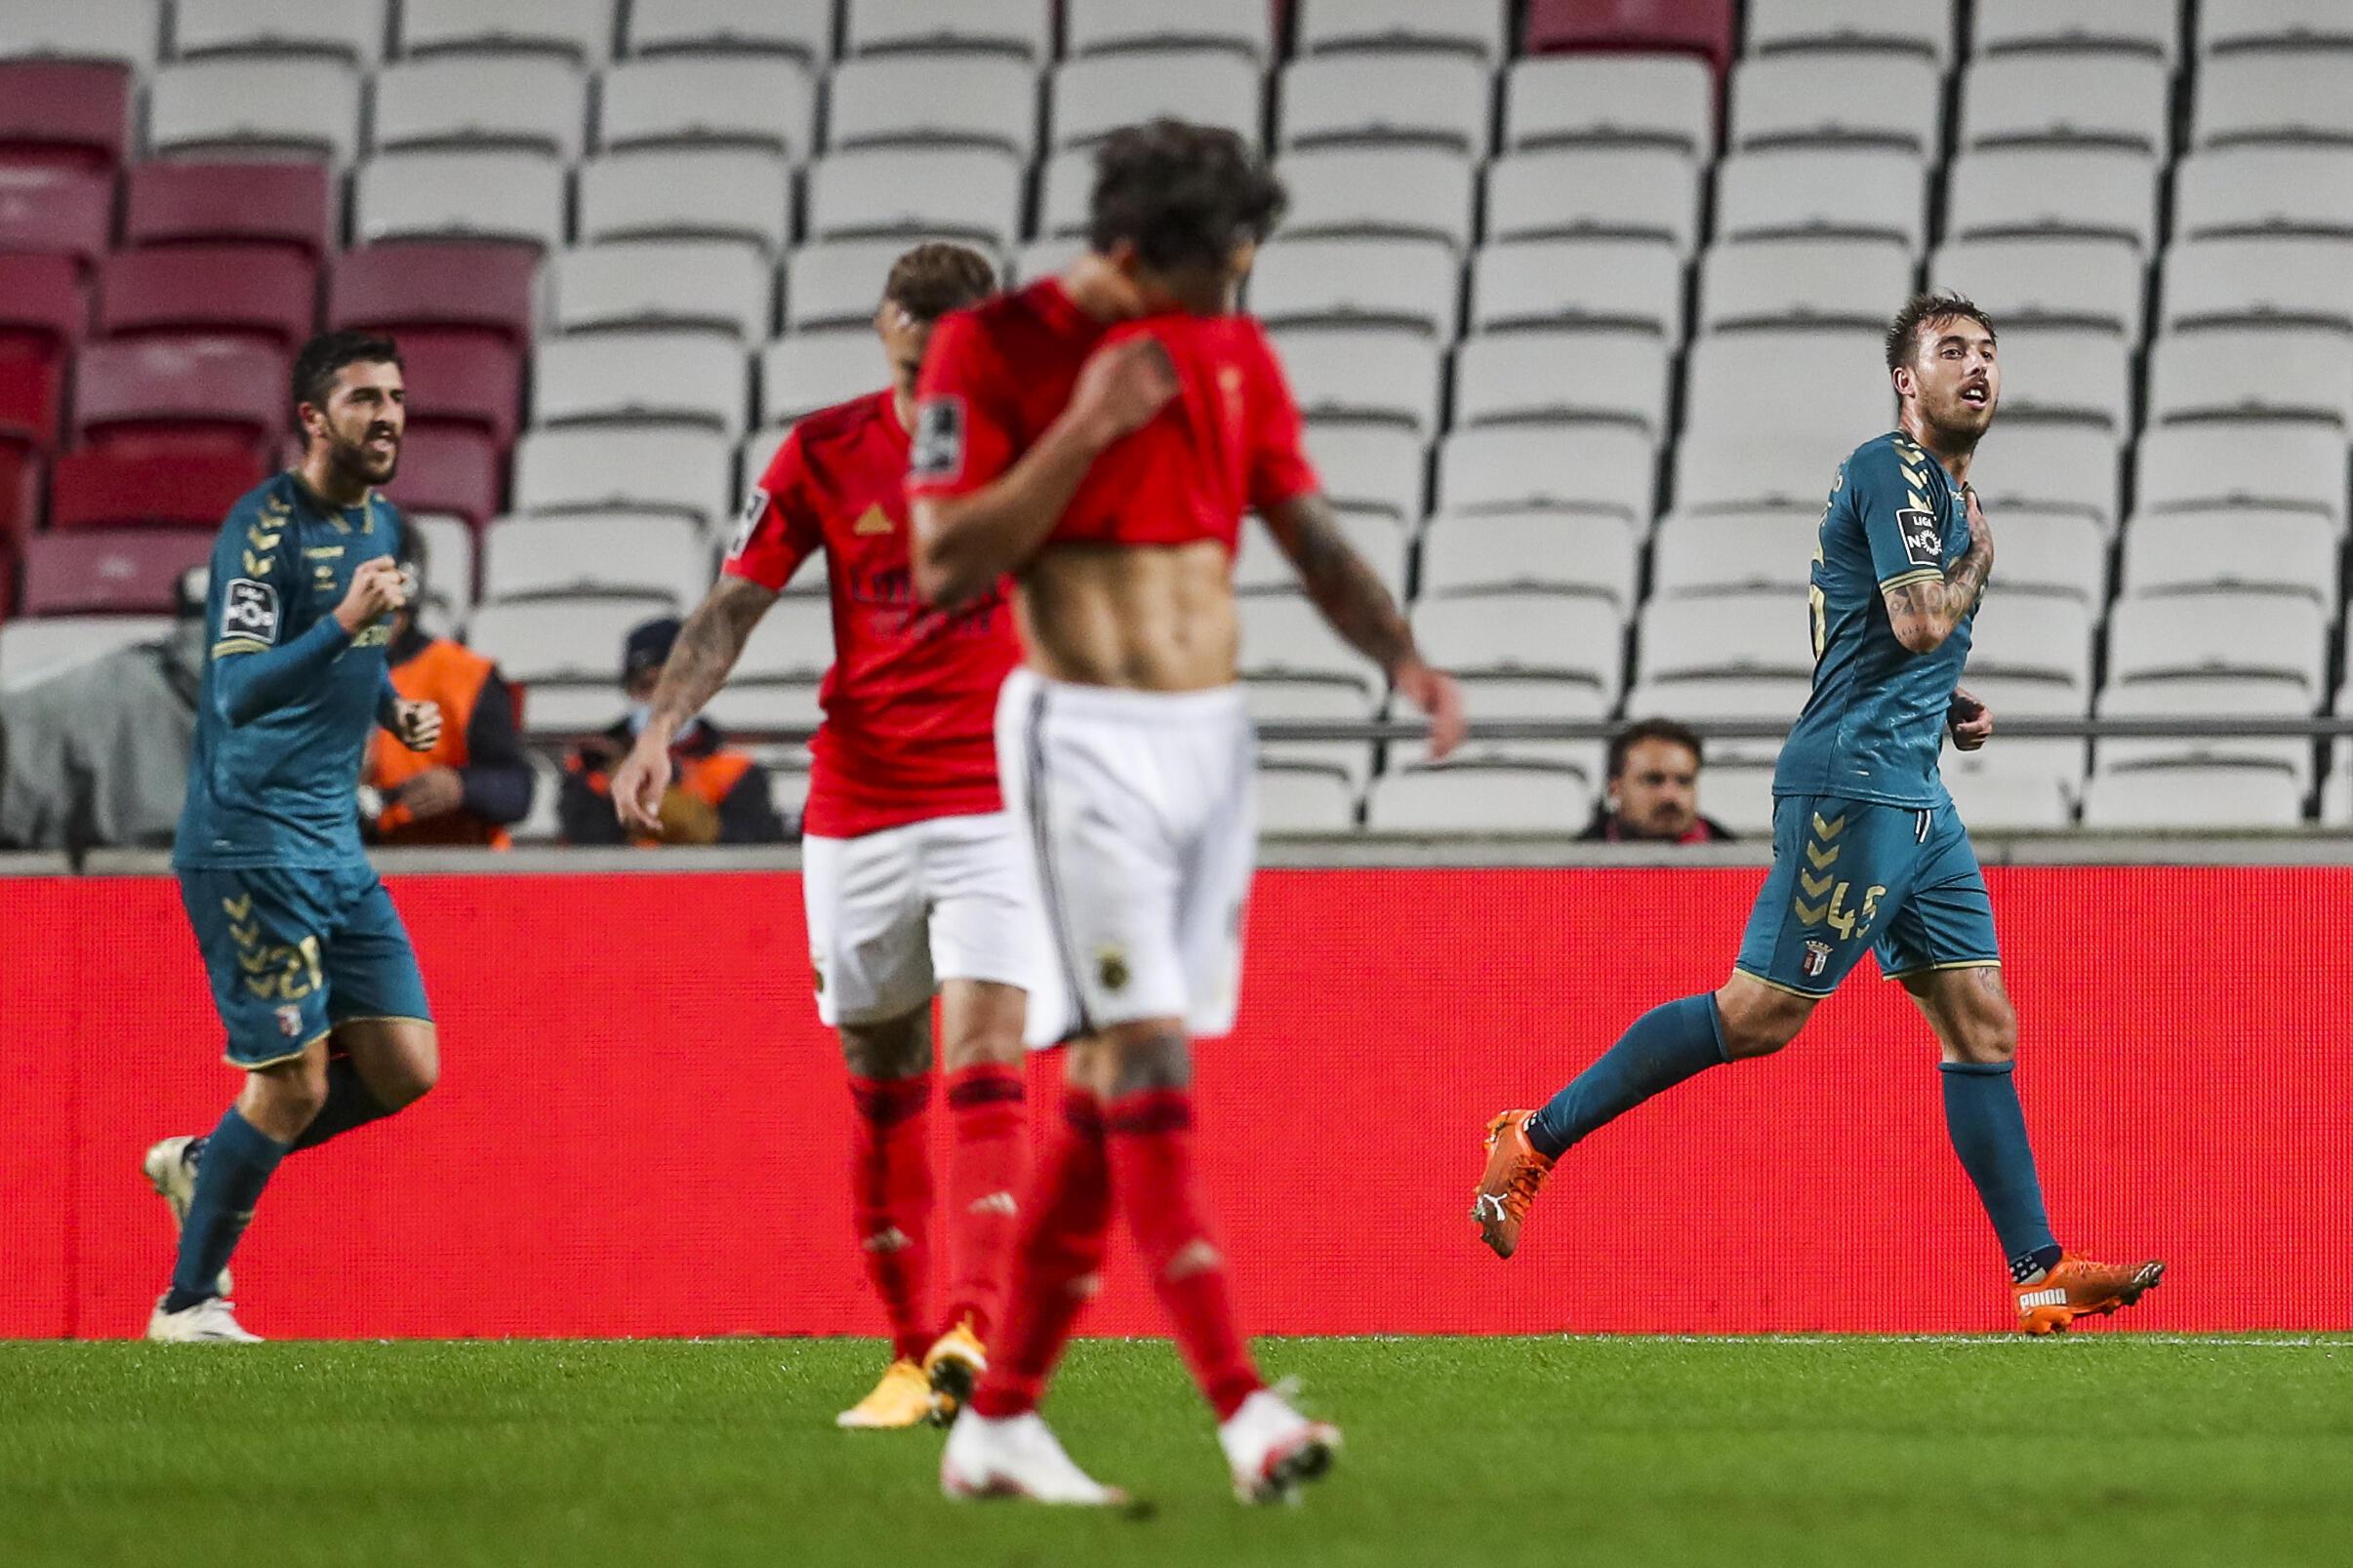 O Benfica perdeu por 2-3 frente ao Sporting de Braga.